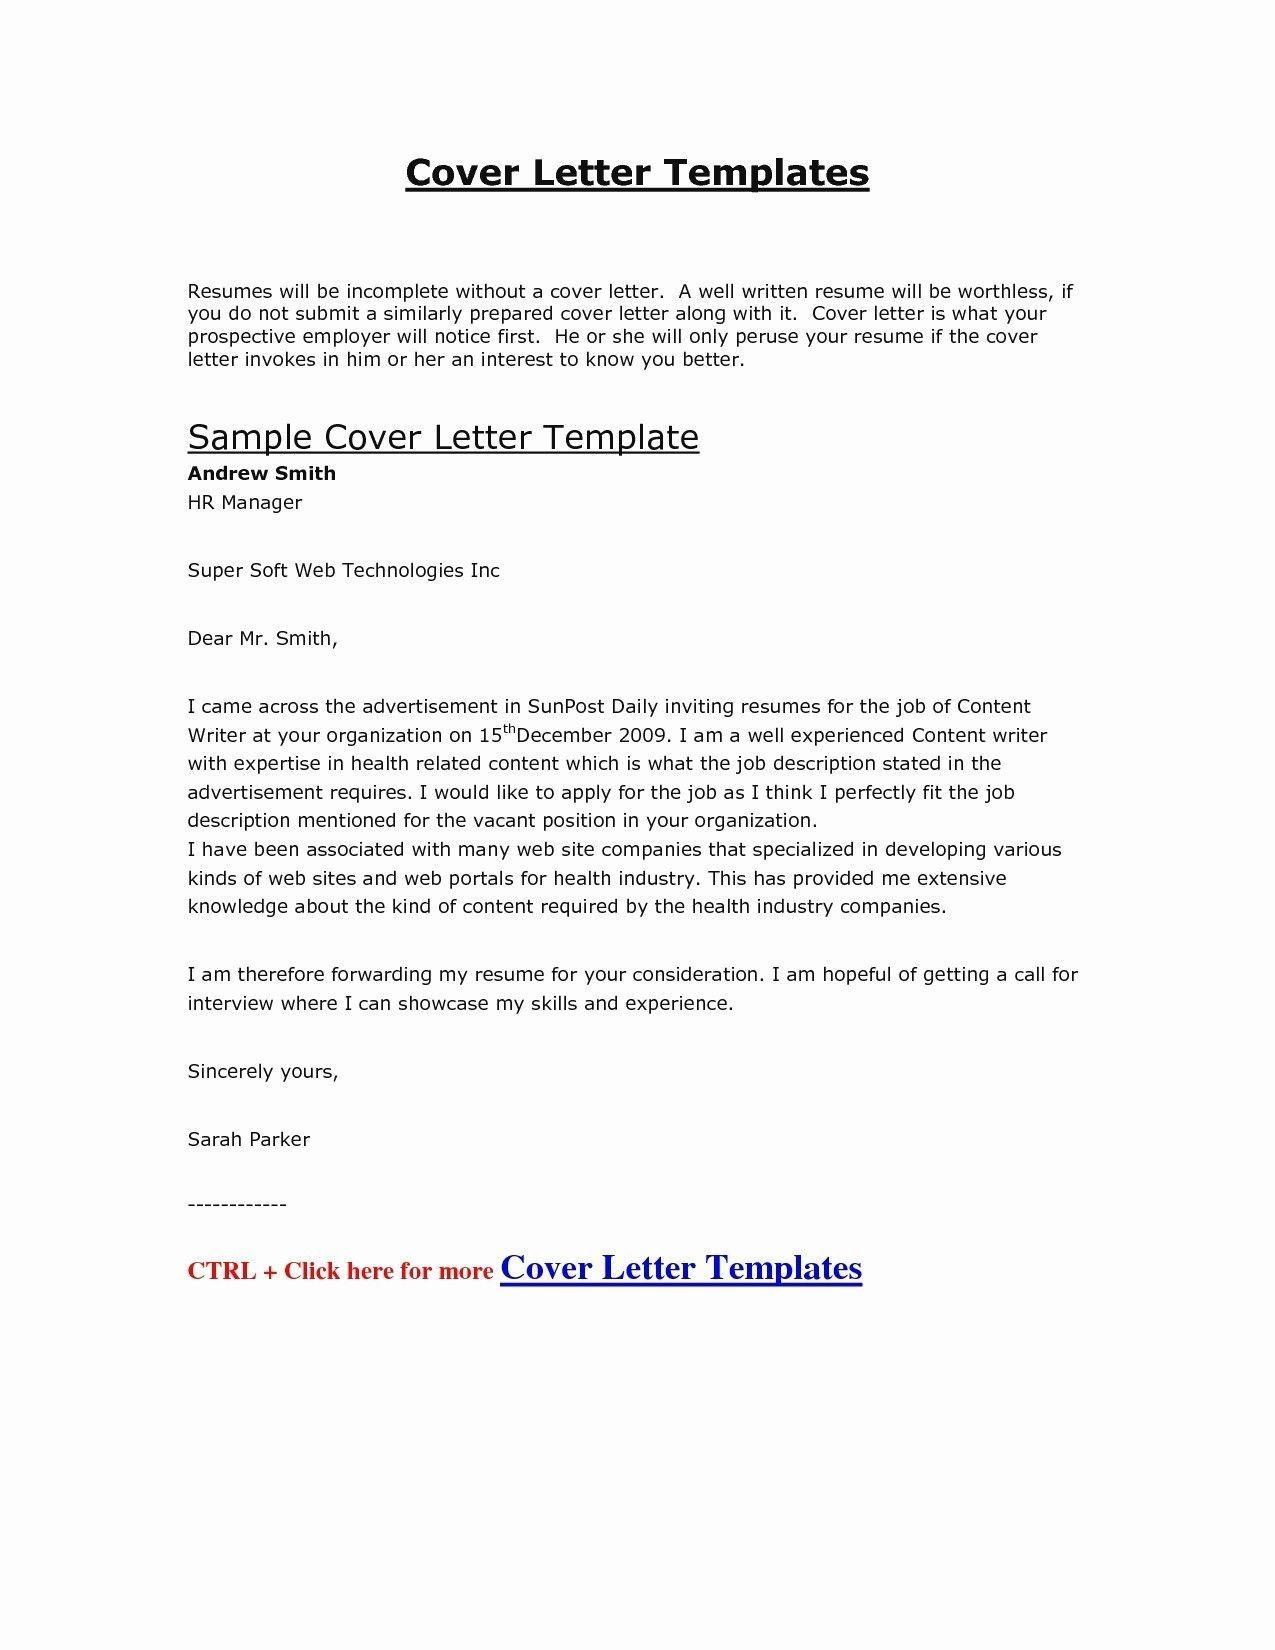 Cover Letter Template Uk 2018 Job Cover Letter Cover Letter For